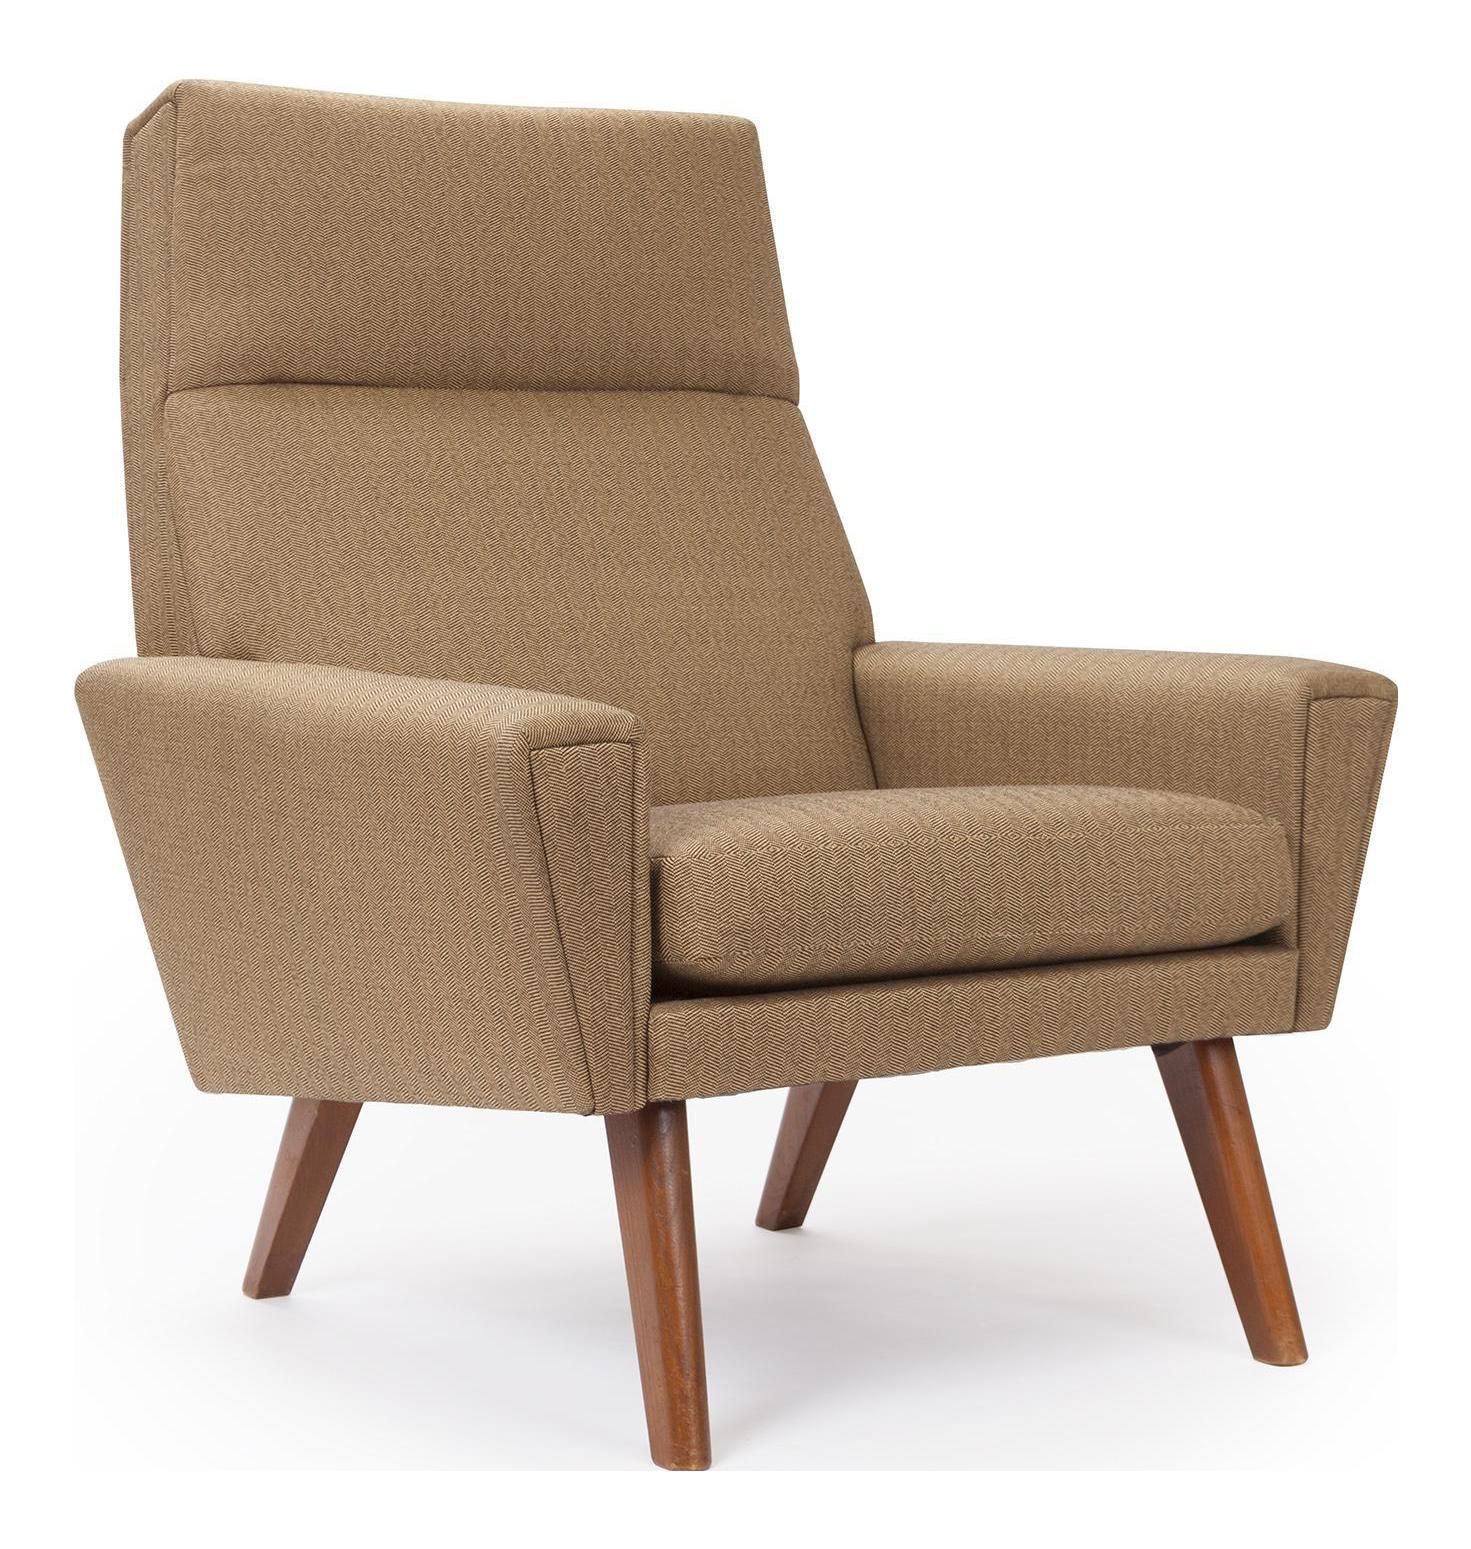 Superieur 1950s Herringbone Tall Back Chair   Image 1 Of 4